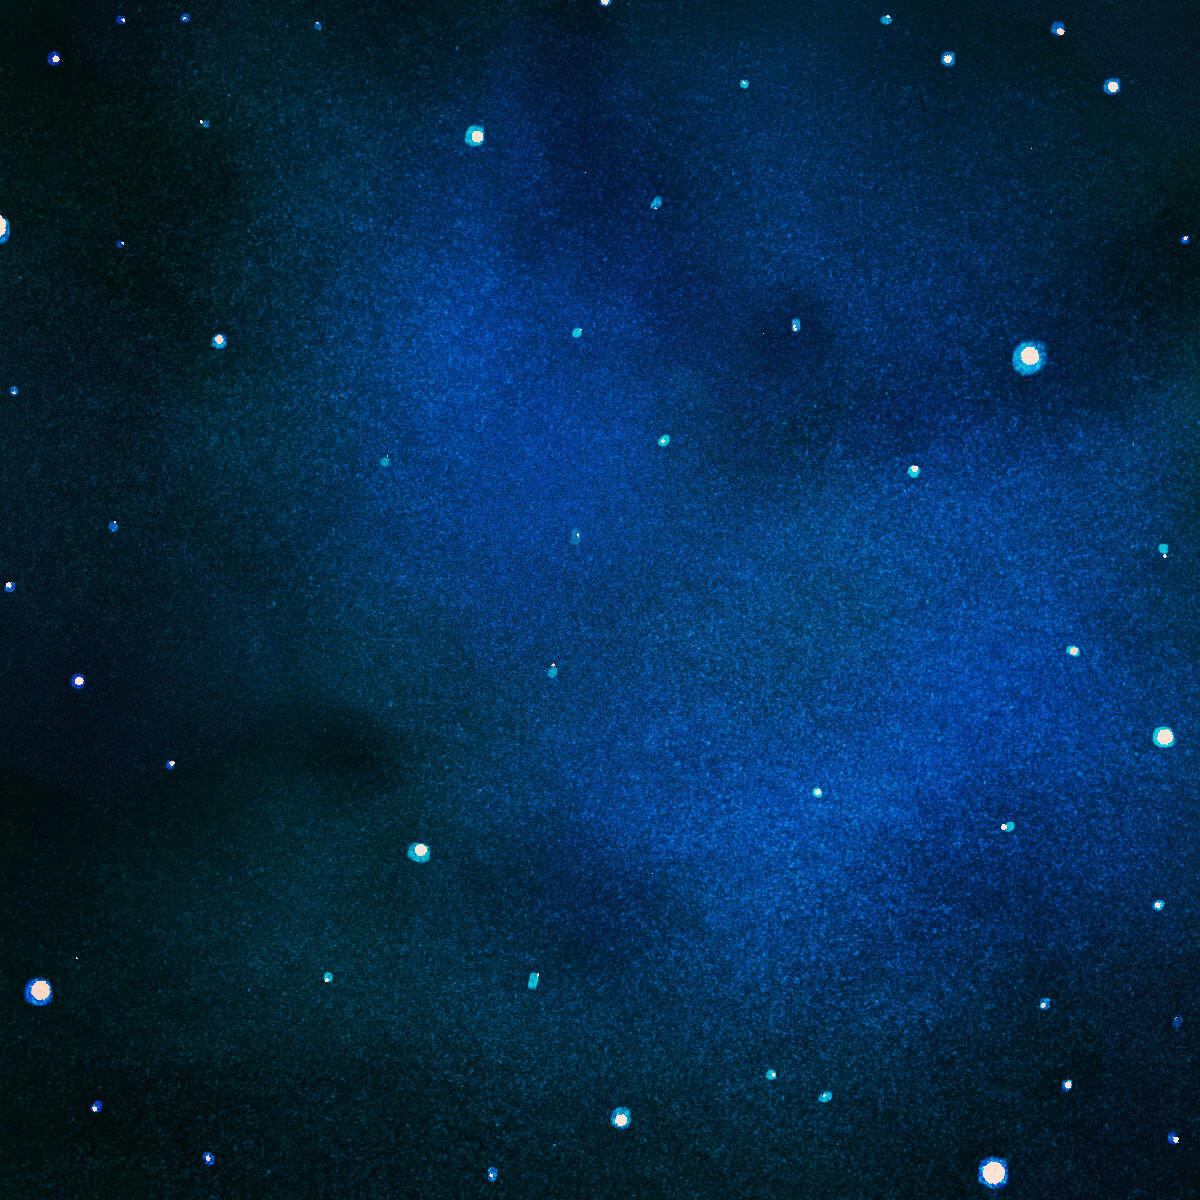 Brienne broyles pl star study 6